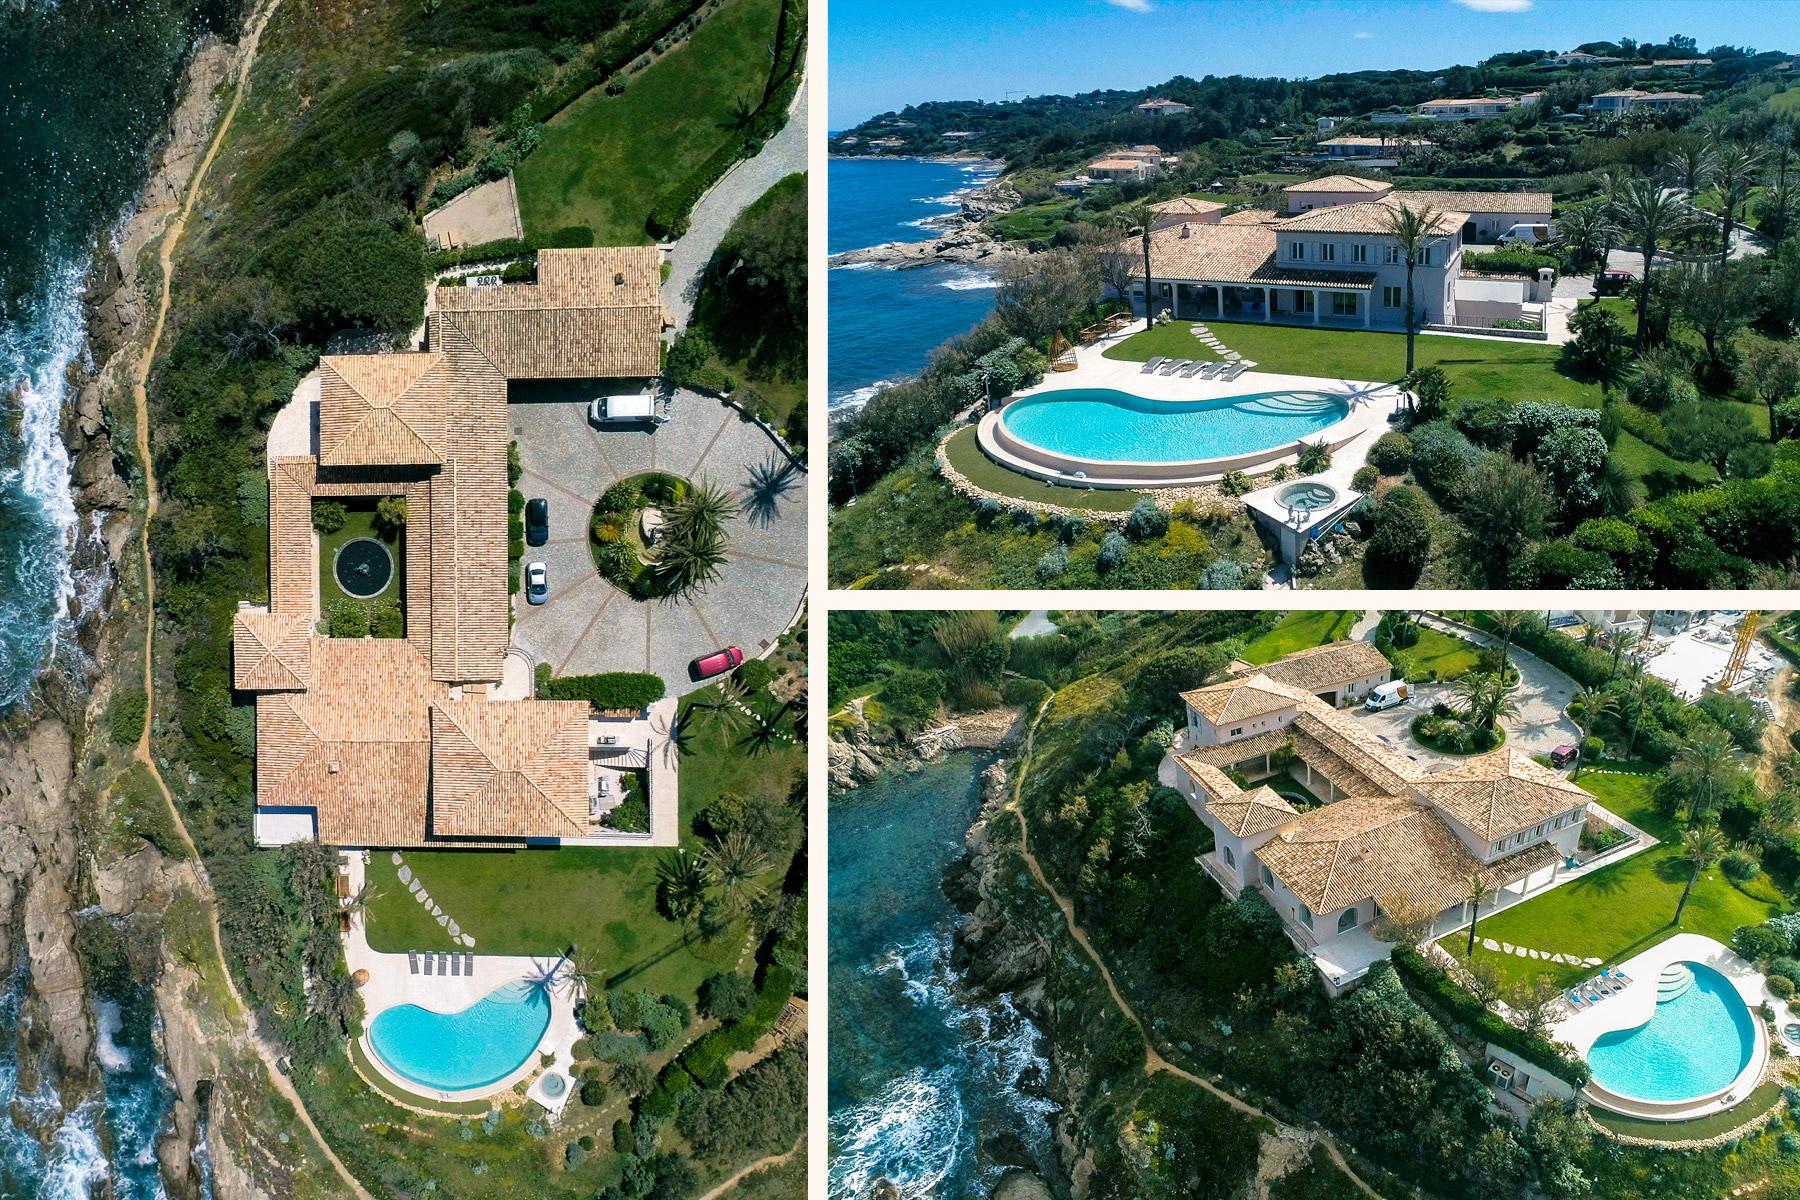 Villa-Copab_Drone-Exterior_1.jpg